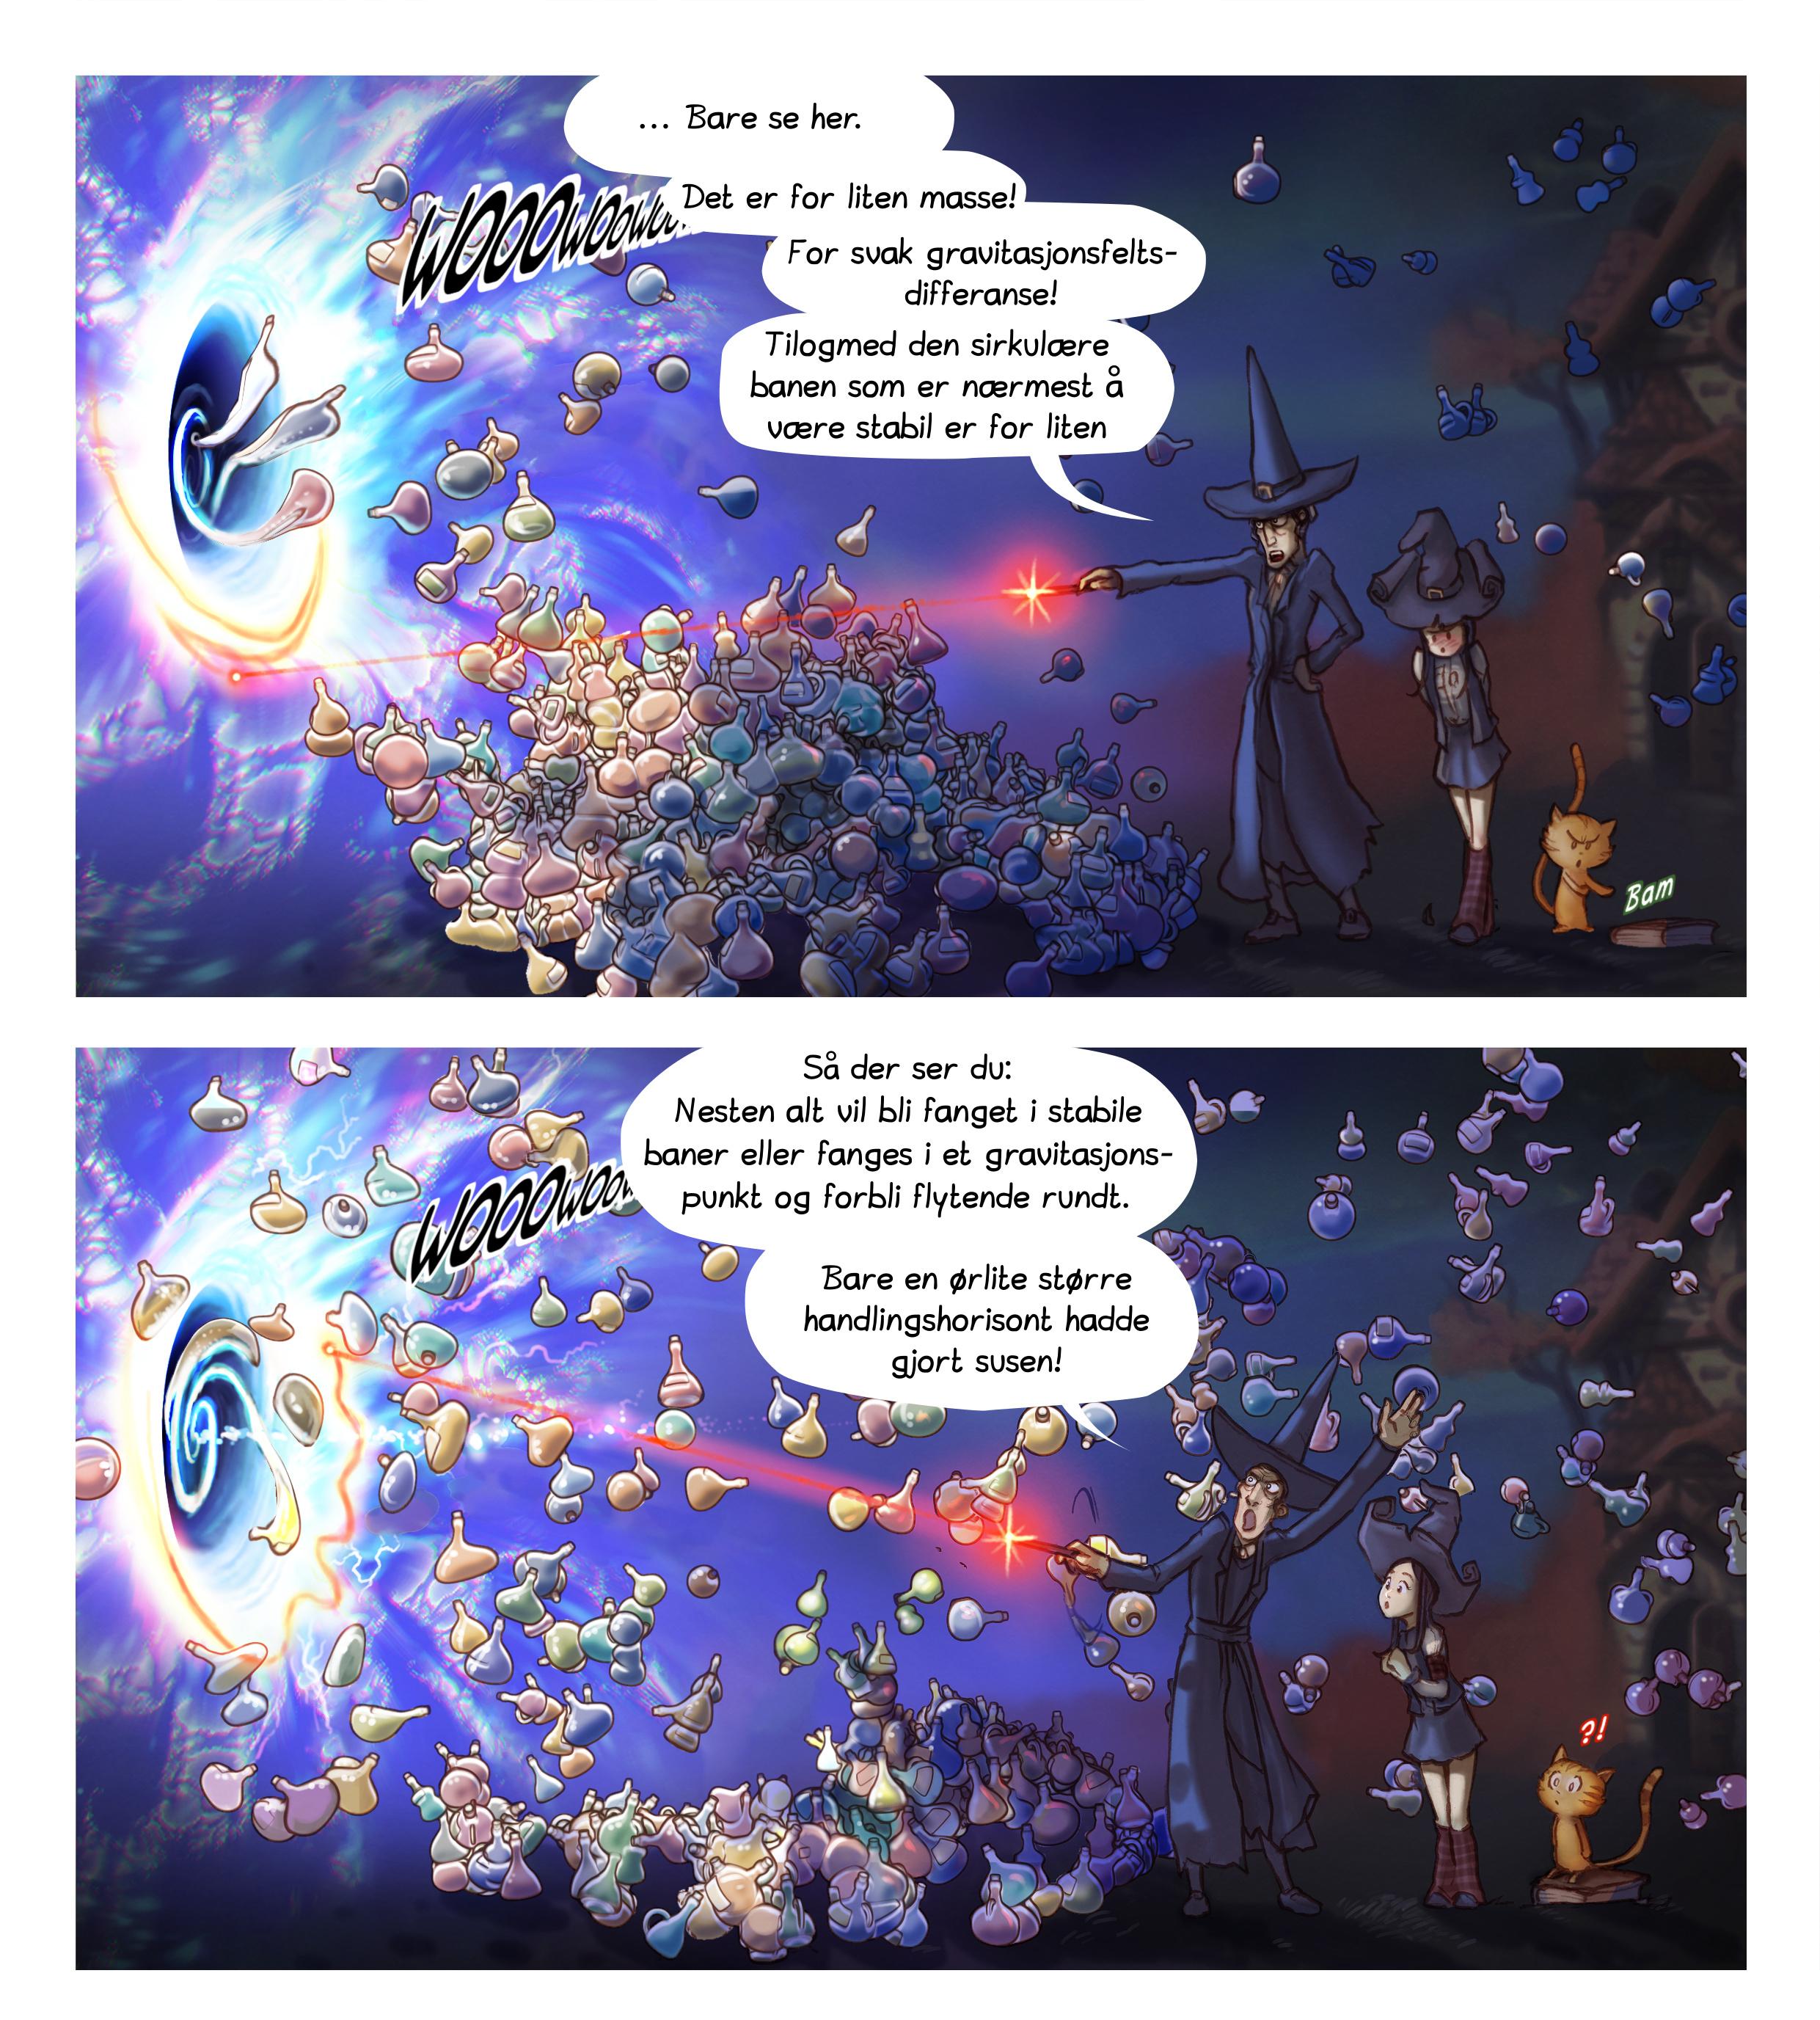 Episode 12: Høstrengjøring, Page 5